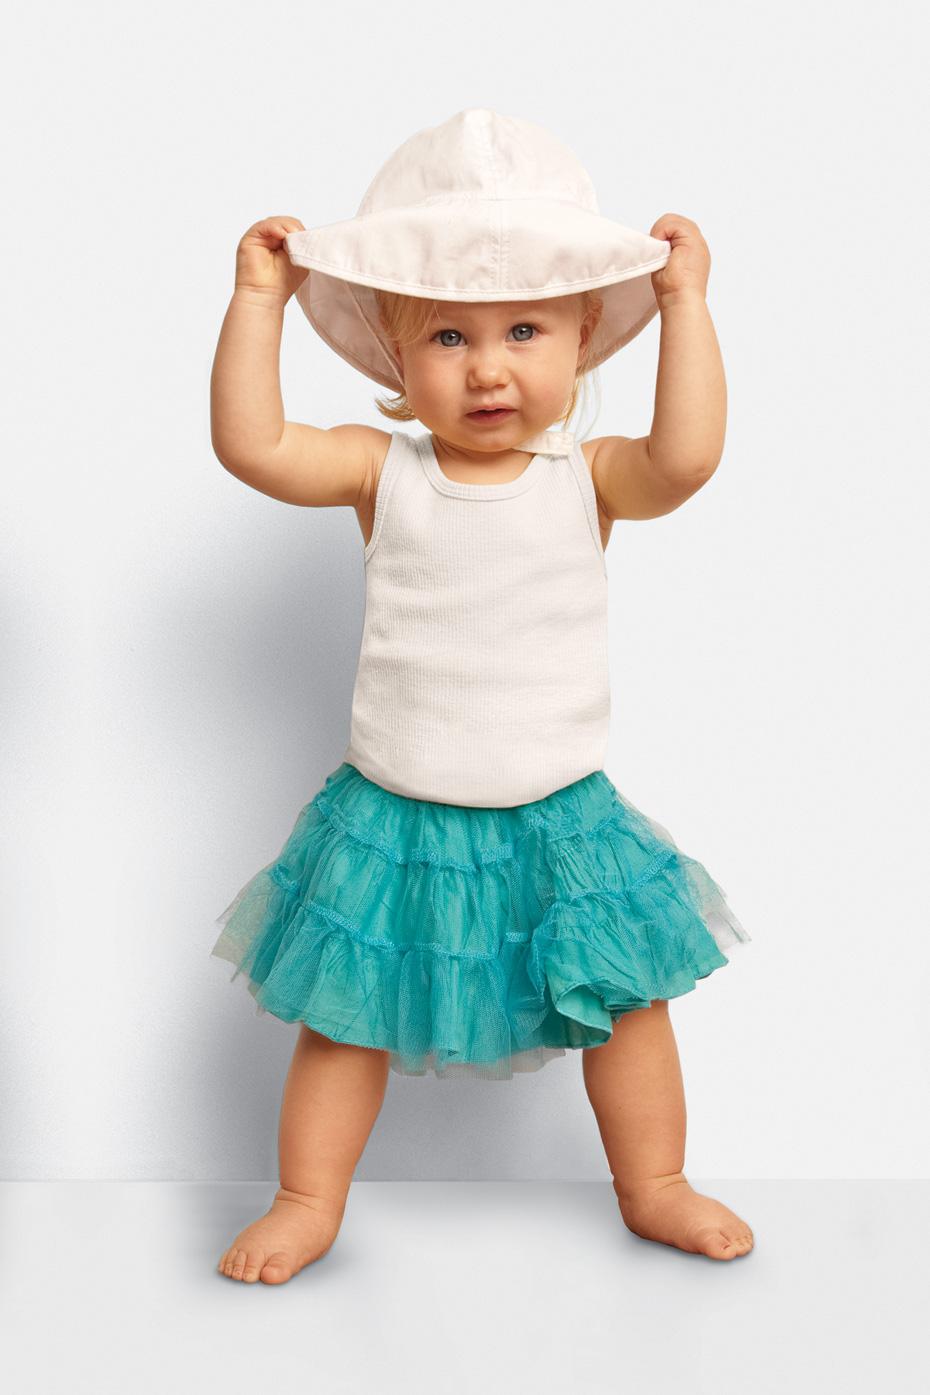 Bel+Can Baby Tanktop 2x1 Rib